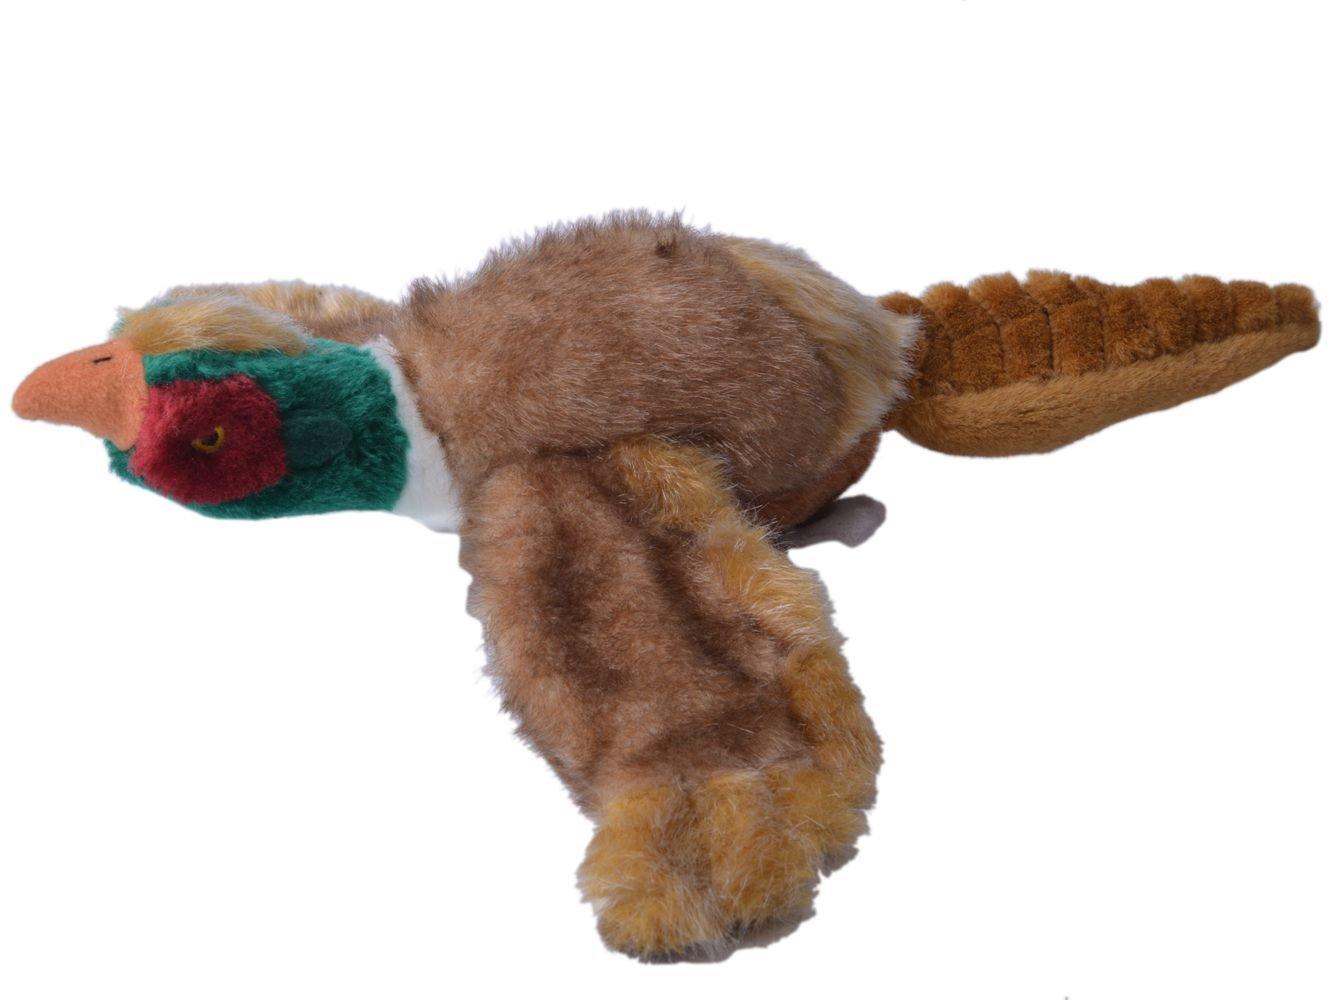 "EXPAWLORER Dog Squeaky Chew Toys Soft Plush for Puppy Medium to Large Breeds 17"" Pheasant"